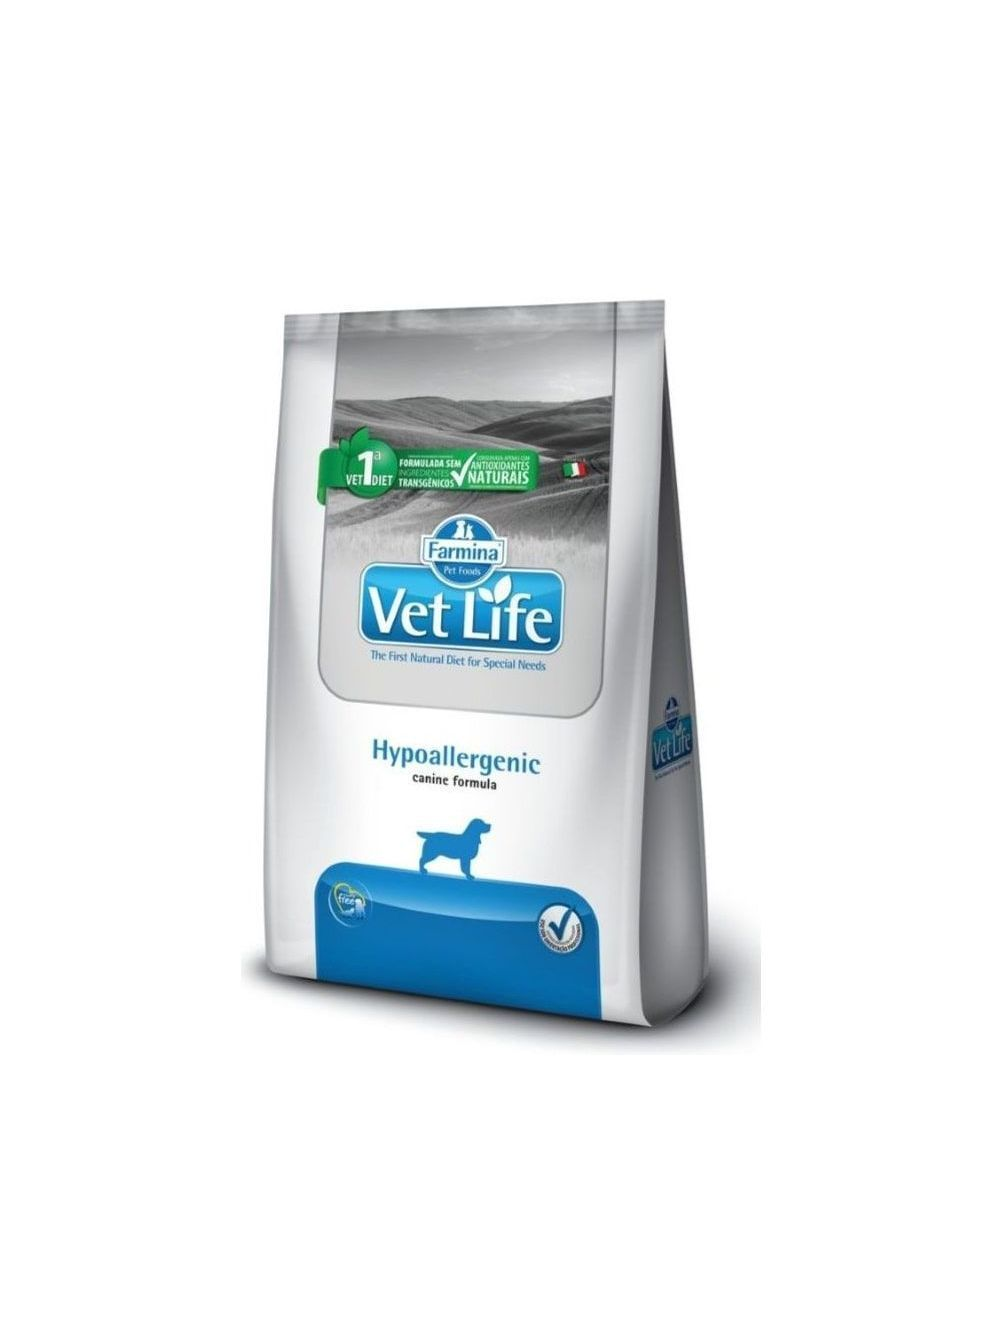 Comida Vet Life Hypoallergenic 10.1 Kg - ciudaddemascotas.com